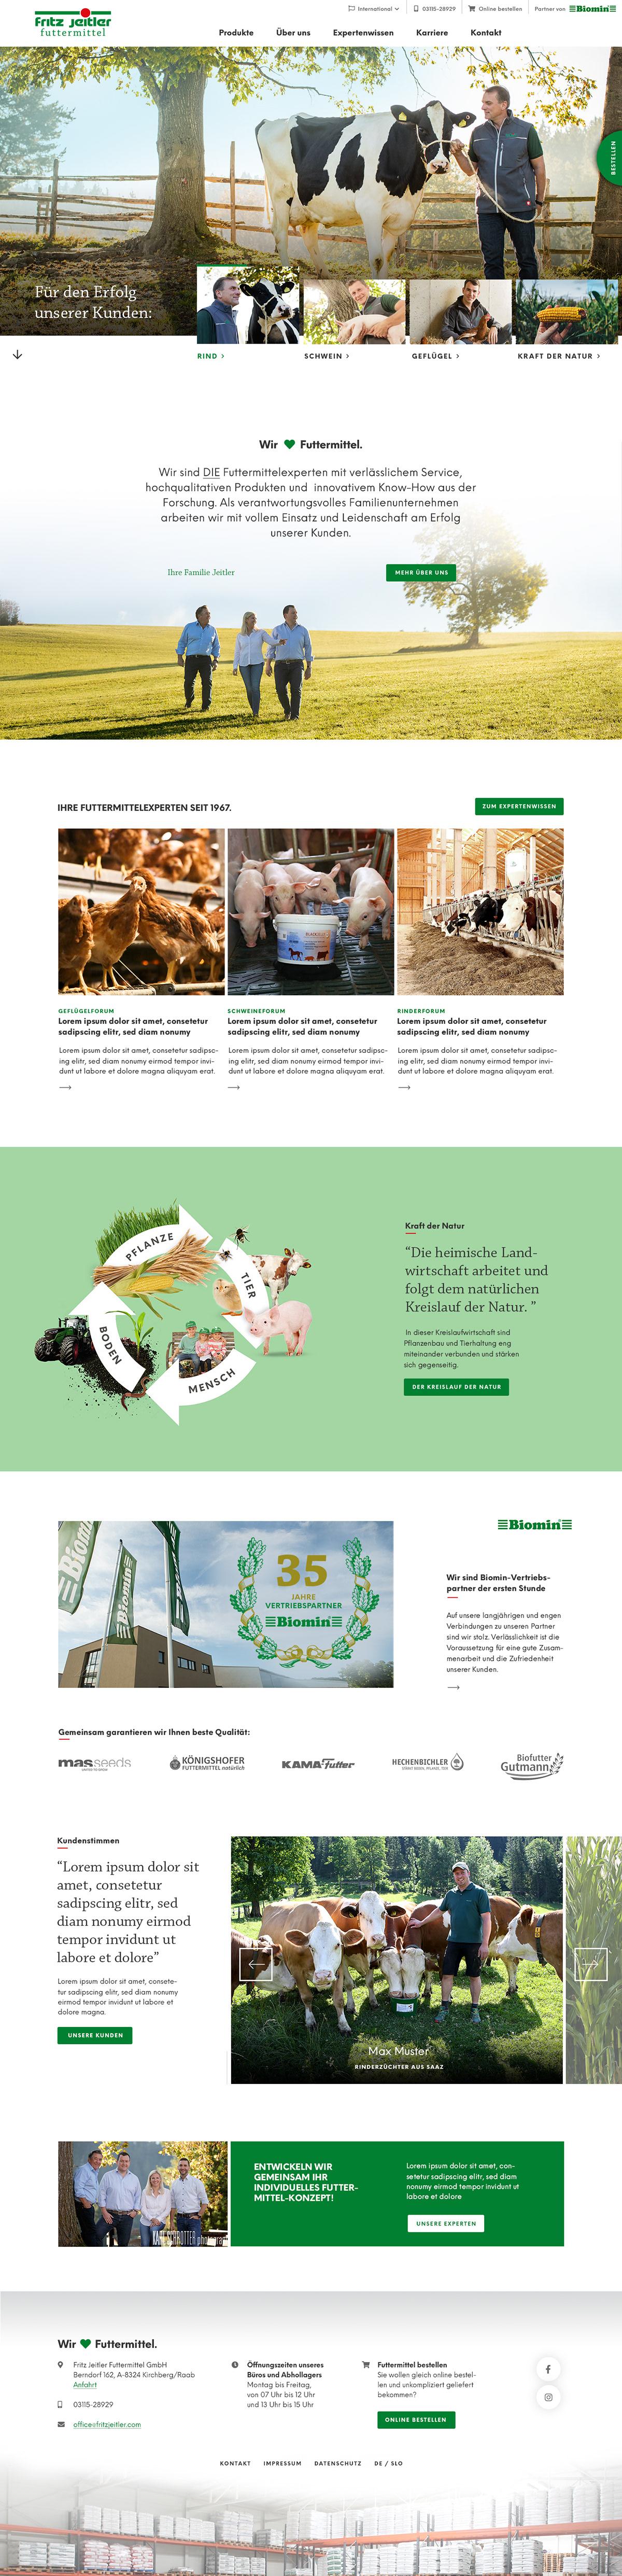 car branding corporate branding interaktionsdesign Website